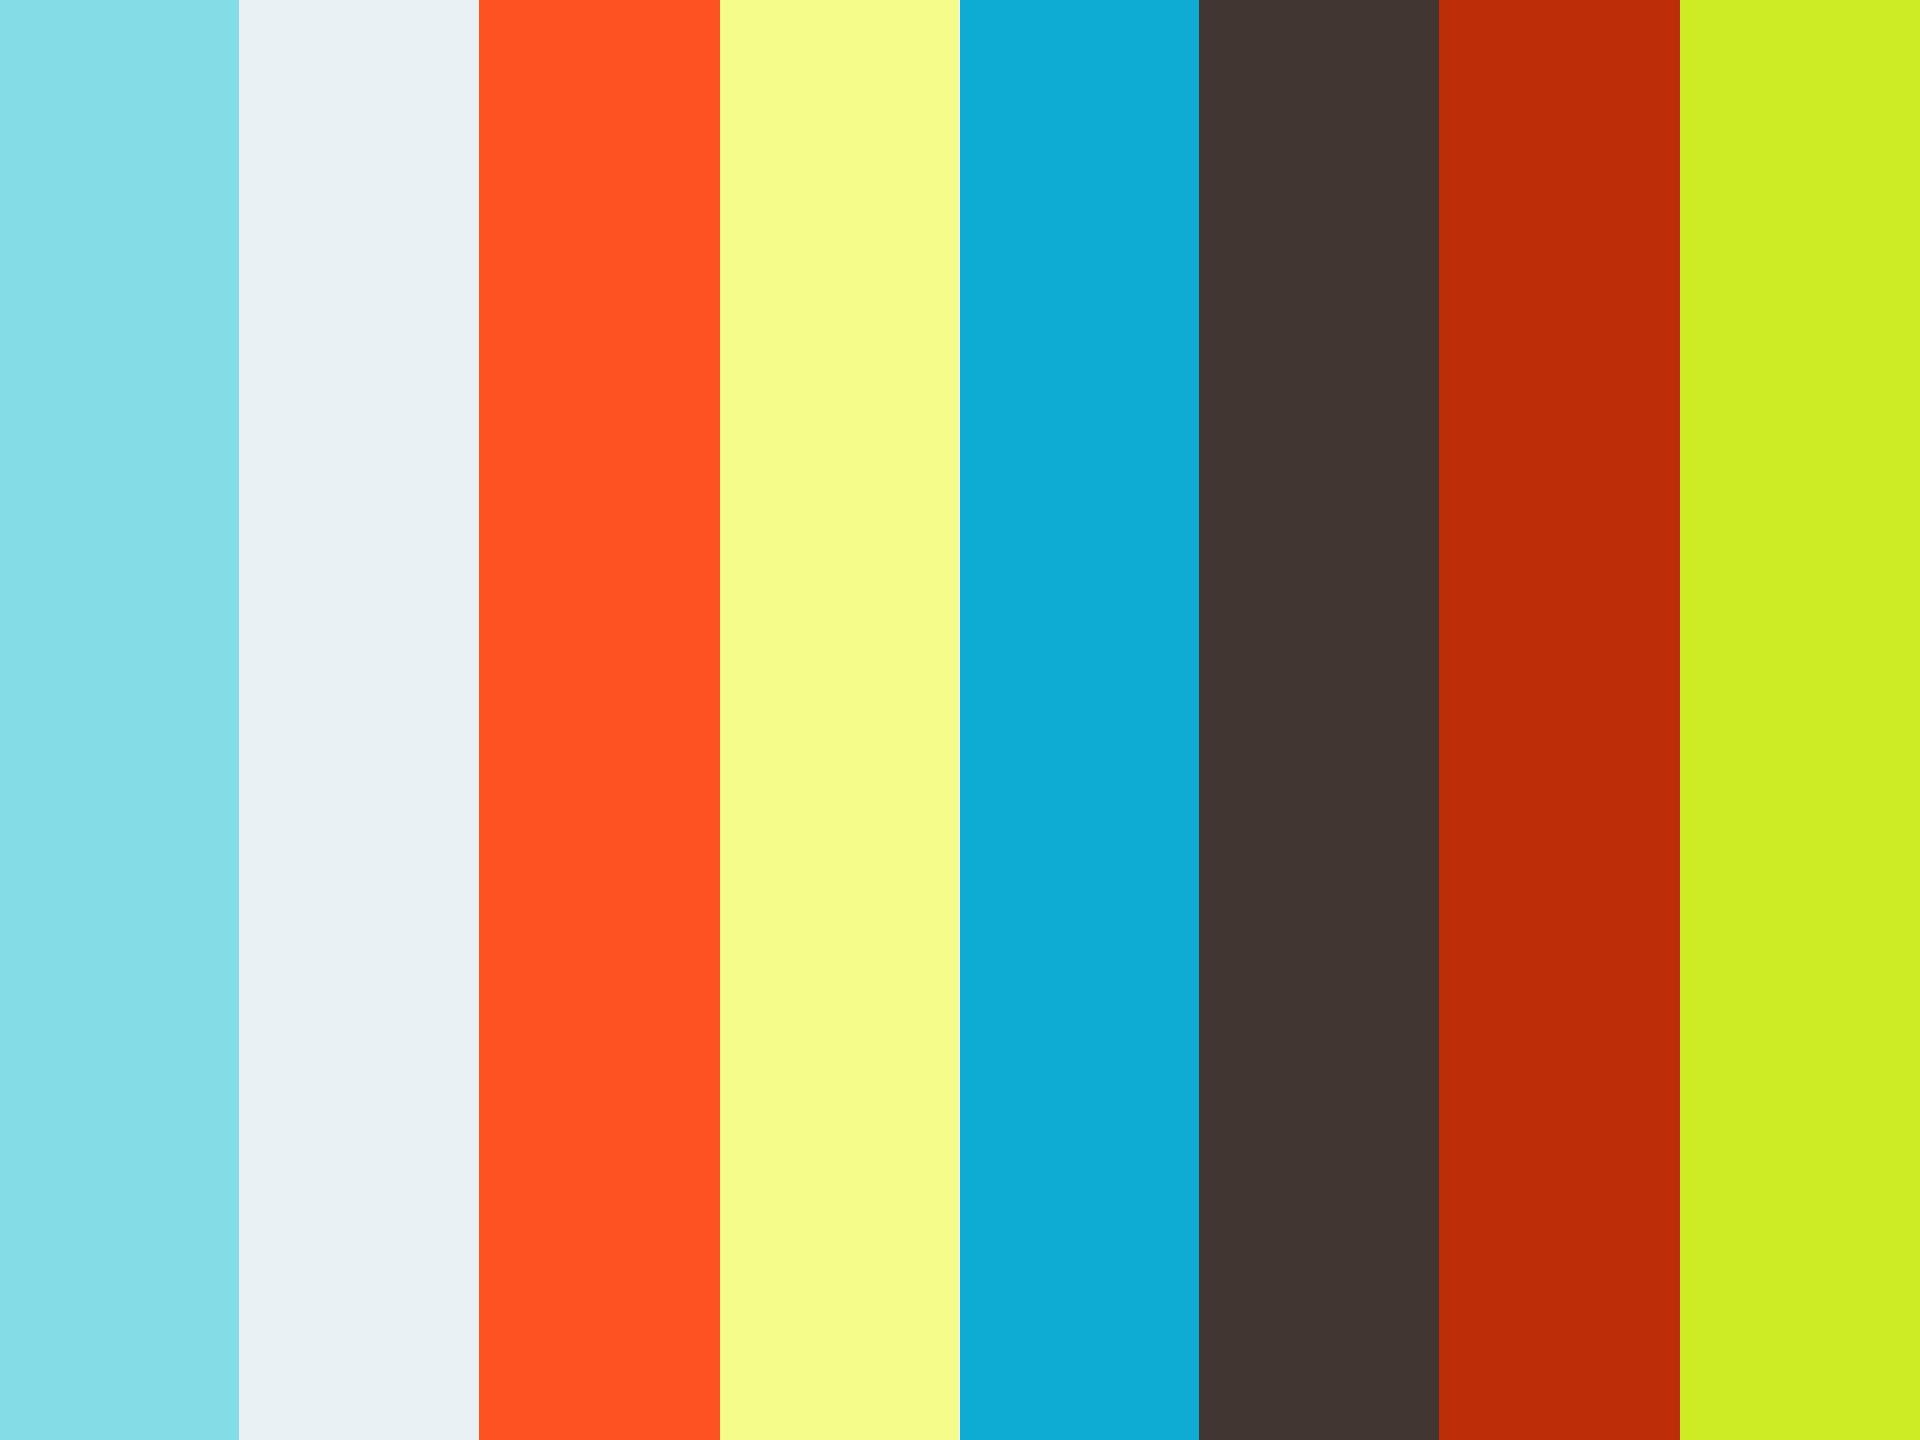 【Proflab】中川種昭 教授インタビュー:慶應義塾大学医学部 歯科・口腔外科学講座